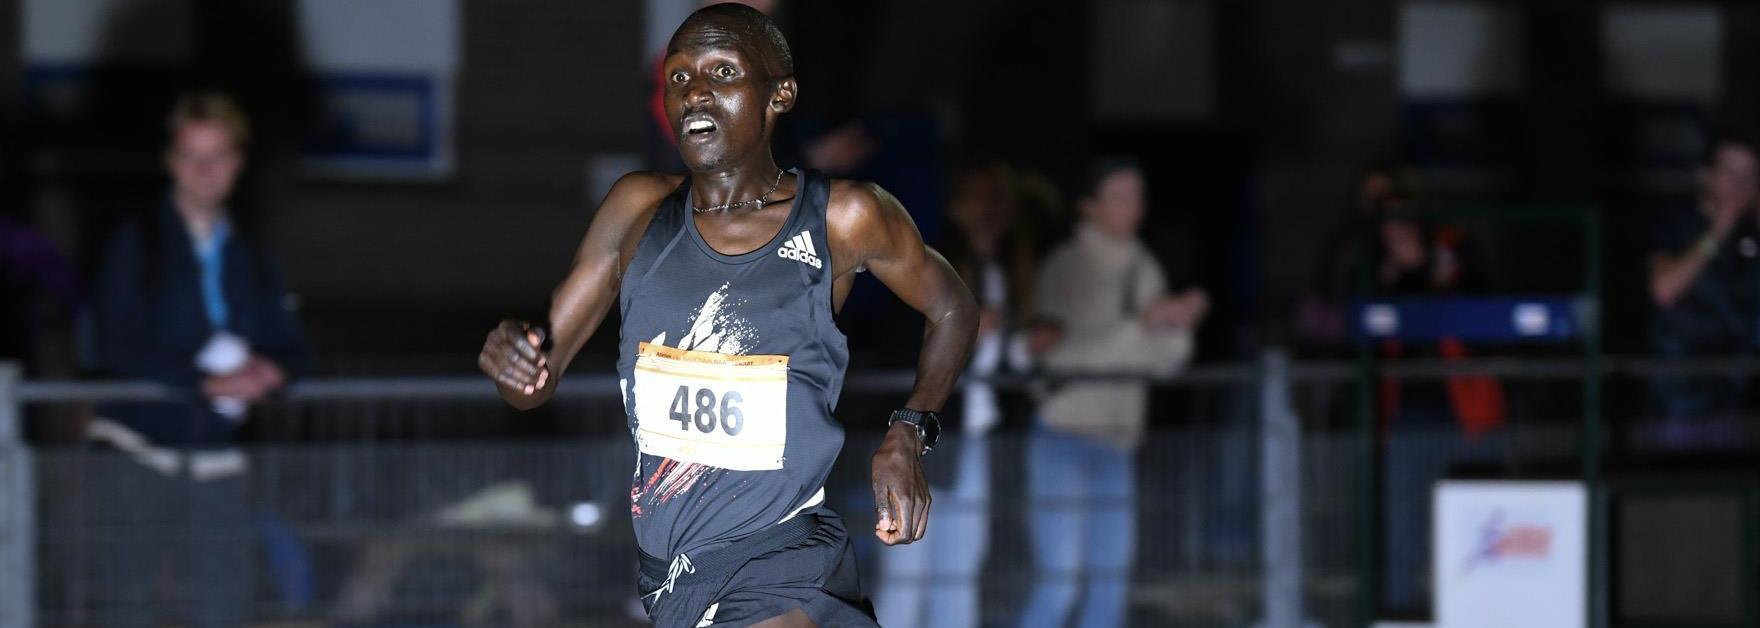 Kimeli clocks 10,000m world lead in Leiden